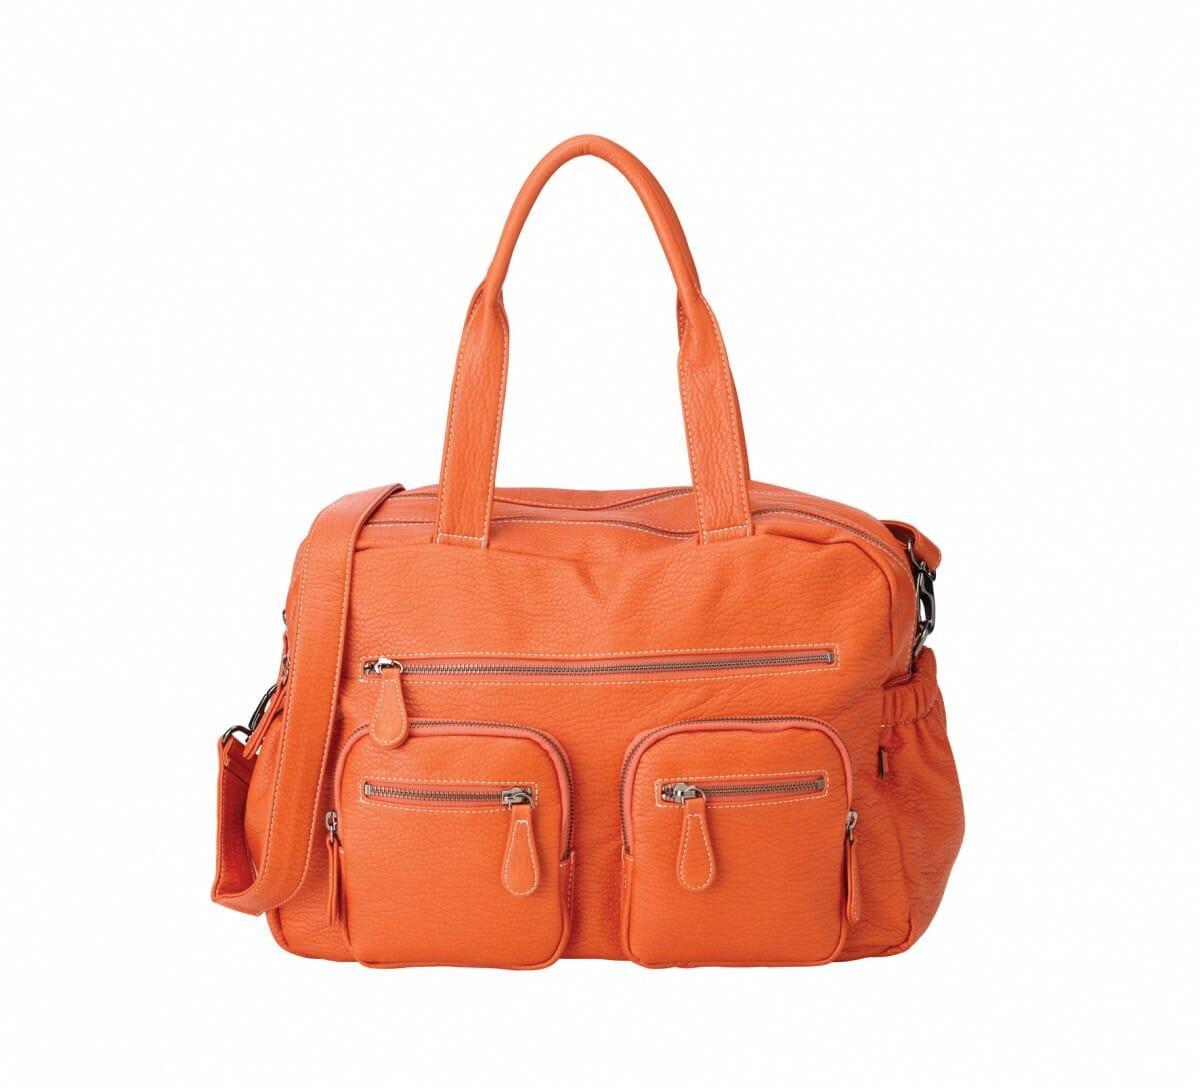 OiOi Tangerine Faux Buffalo Carry All Nappy Bag